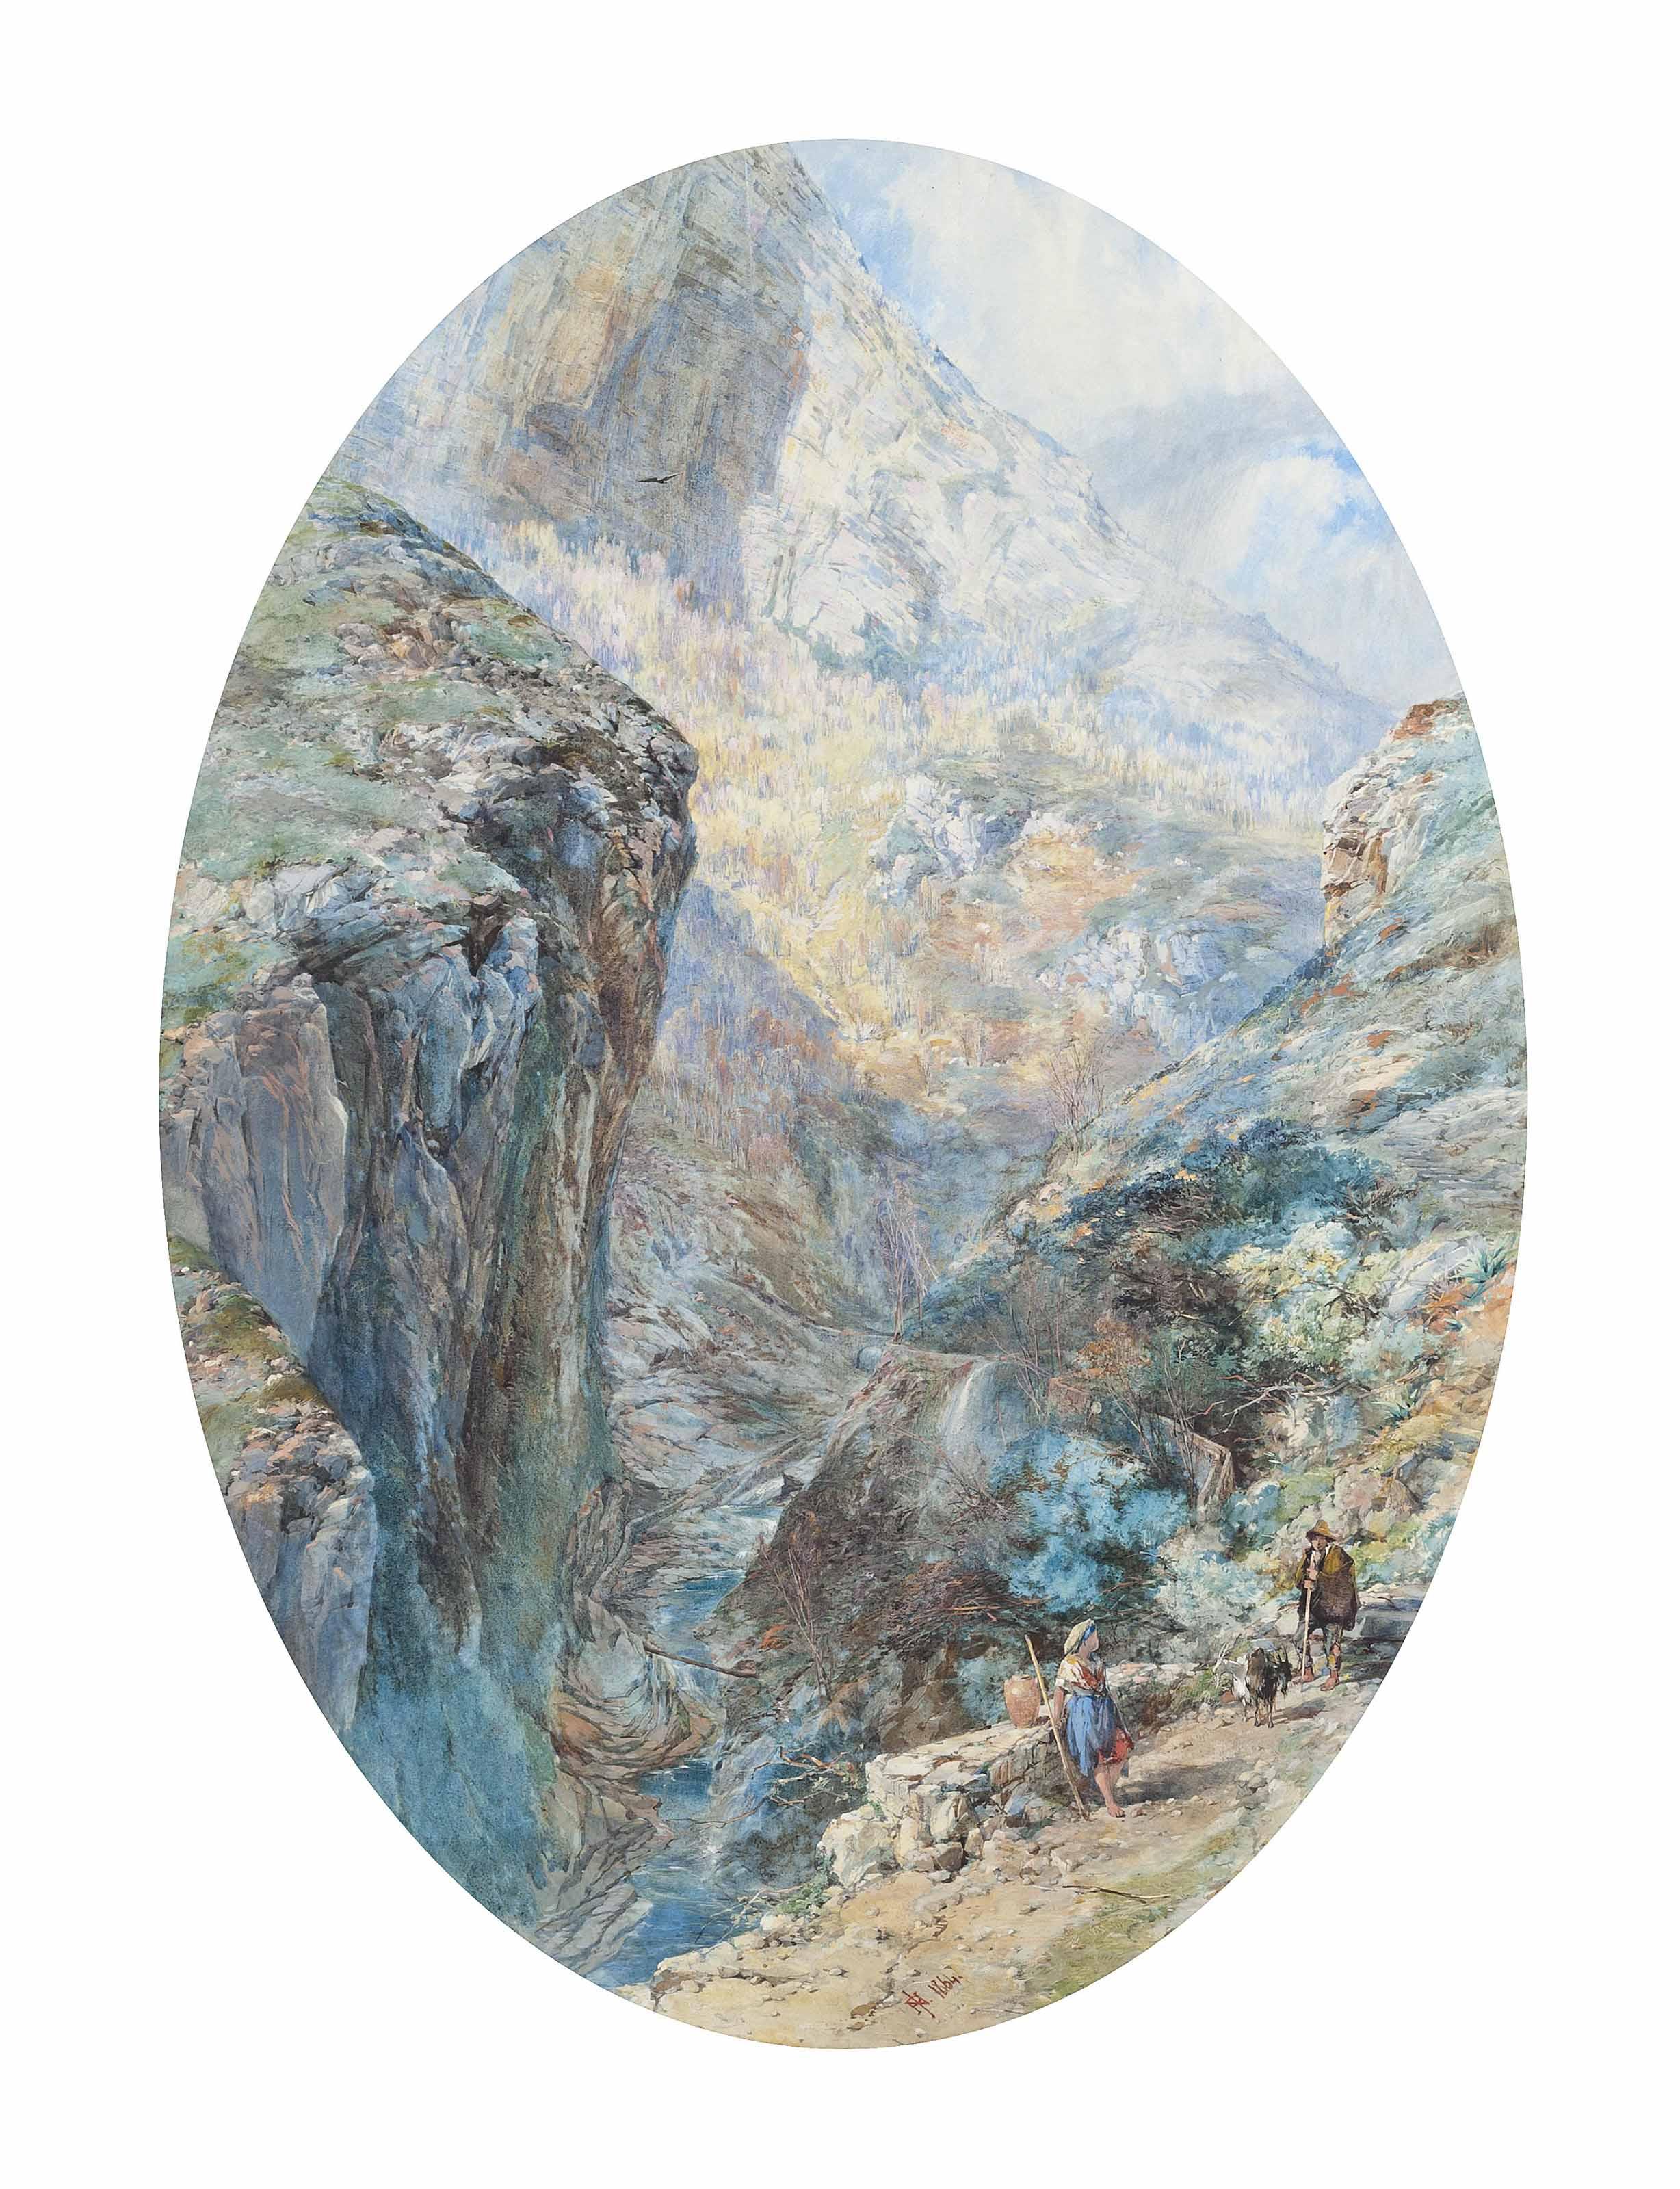 Near Amalfi, the Valley de Moulins